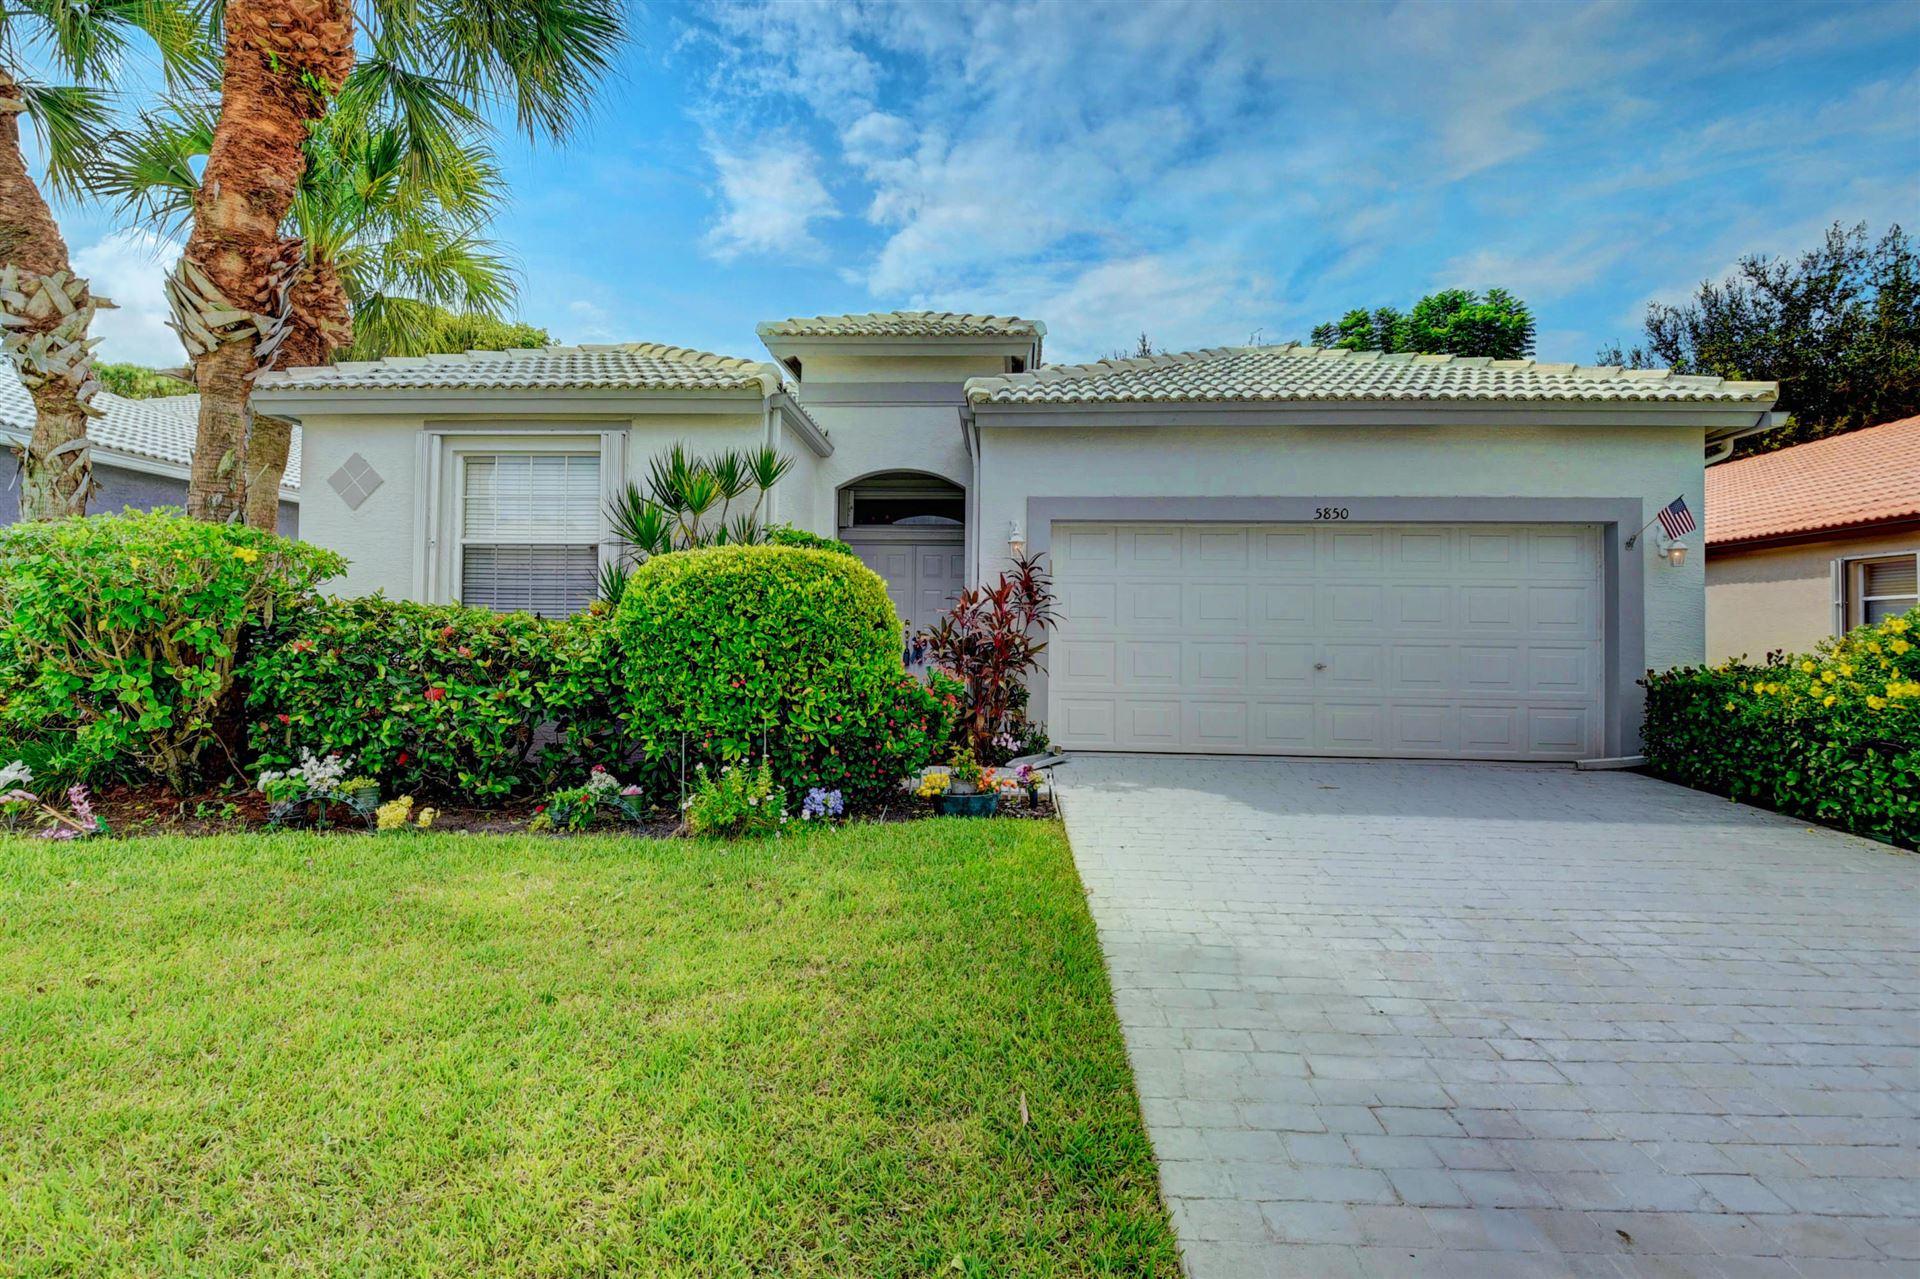 5850 Seashell Terrace, Boynton Beach, FL 33437 - #: RX-10659432